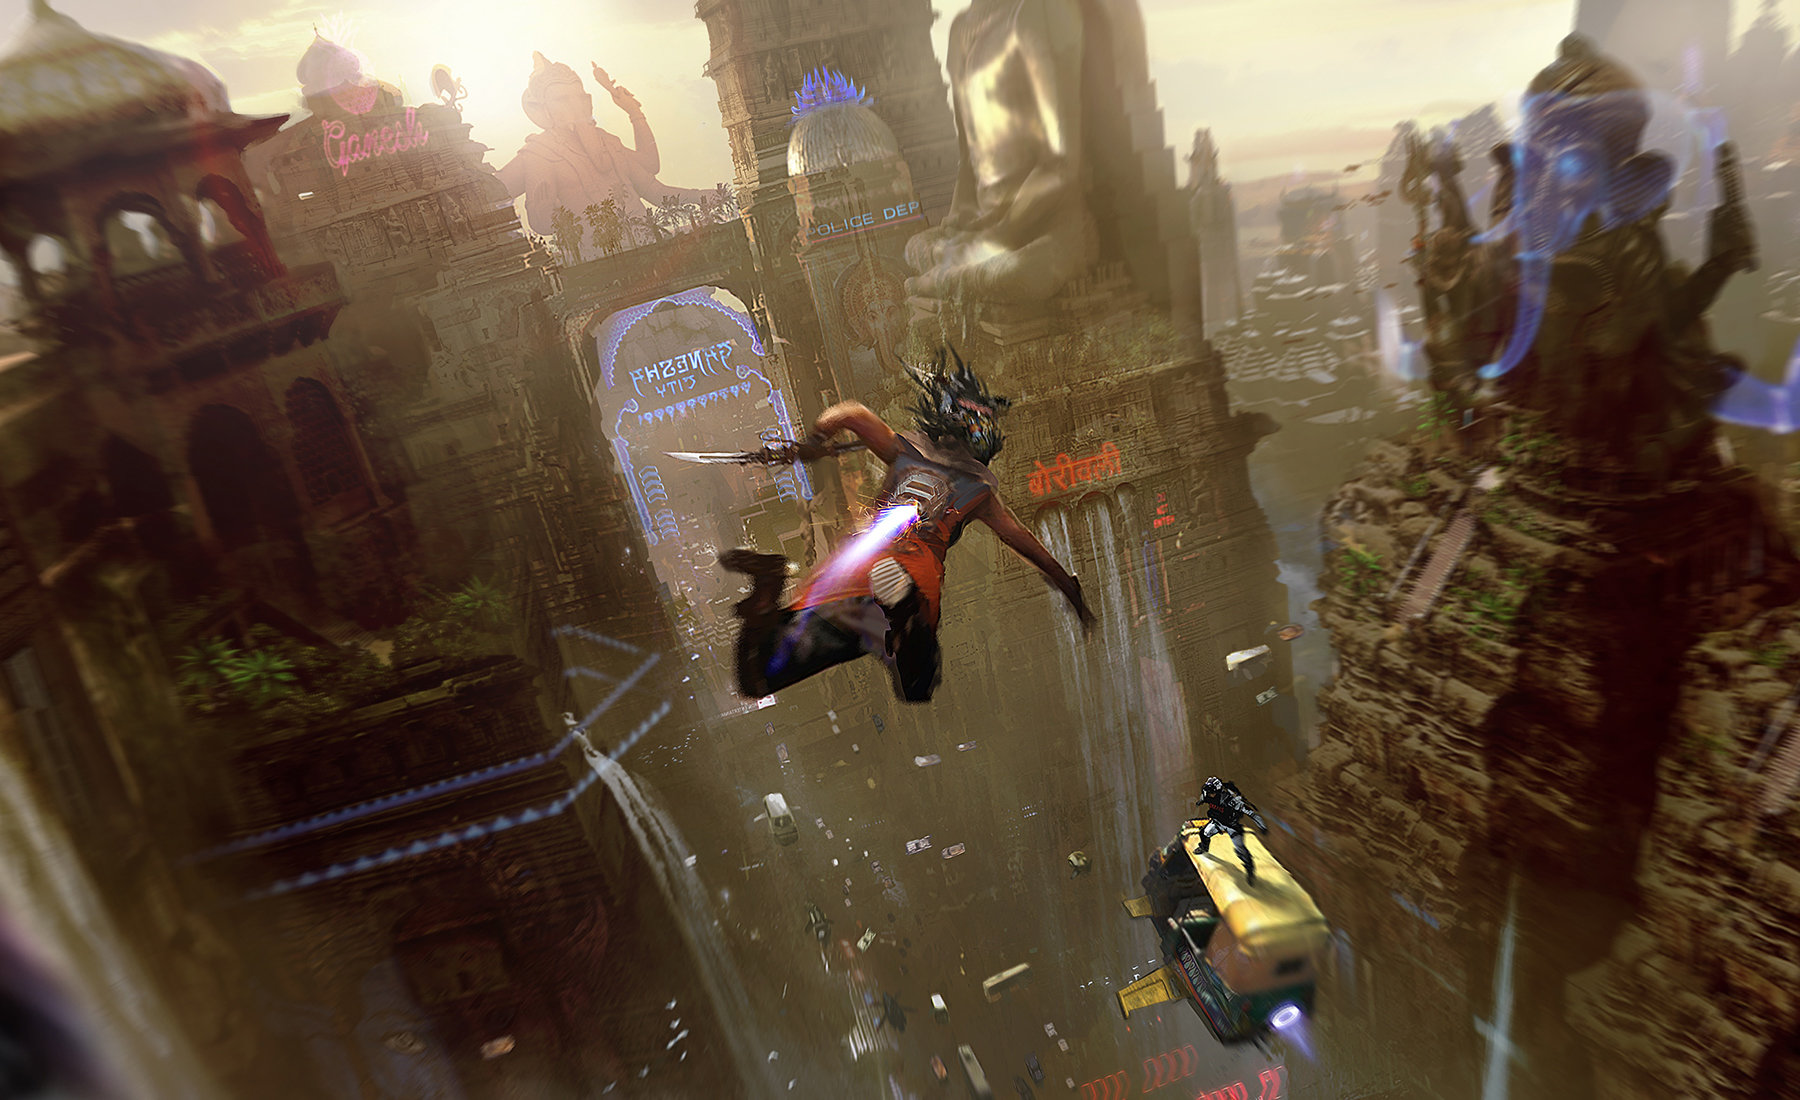 Beyond Good & Evil 2 / Credit: Ubisoft